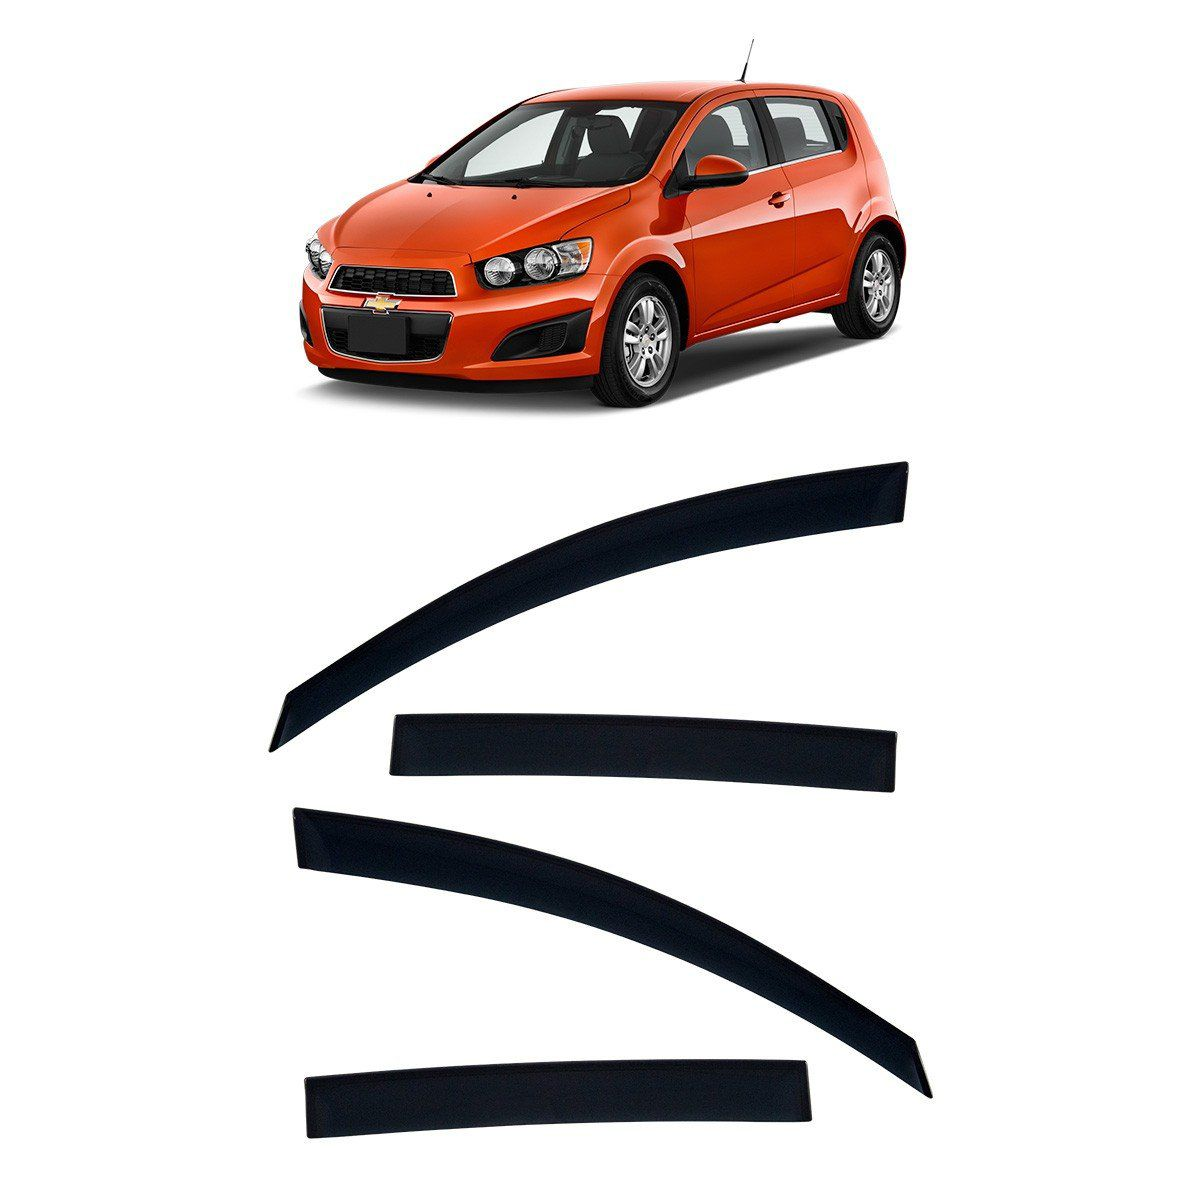 Calha De Chuva Para Sonic Hatch 2011 A 2015 TG Poli